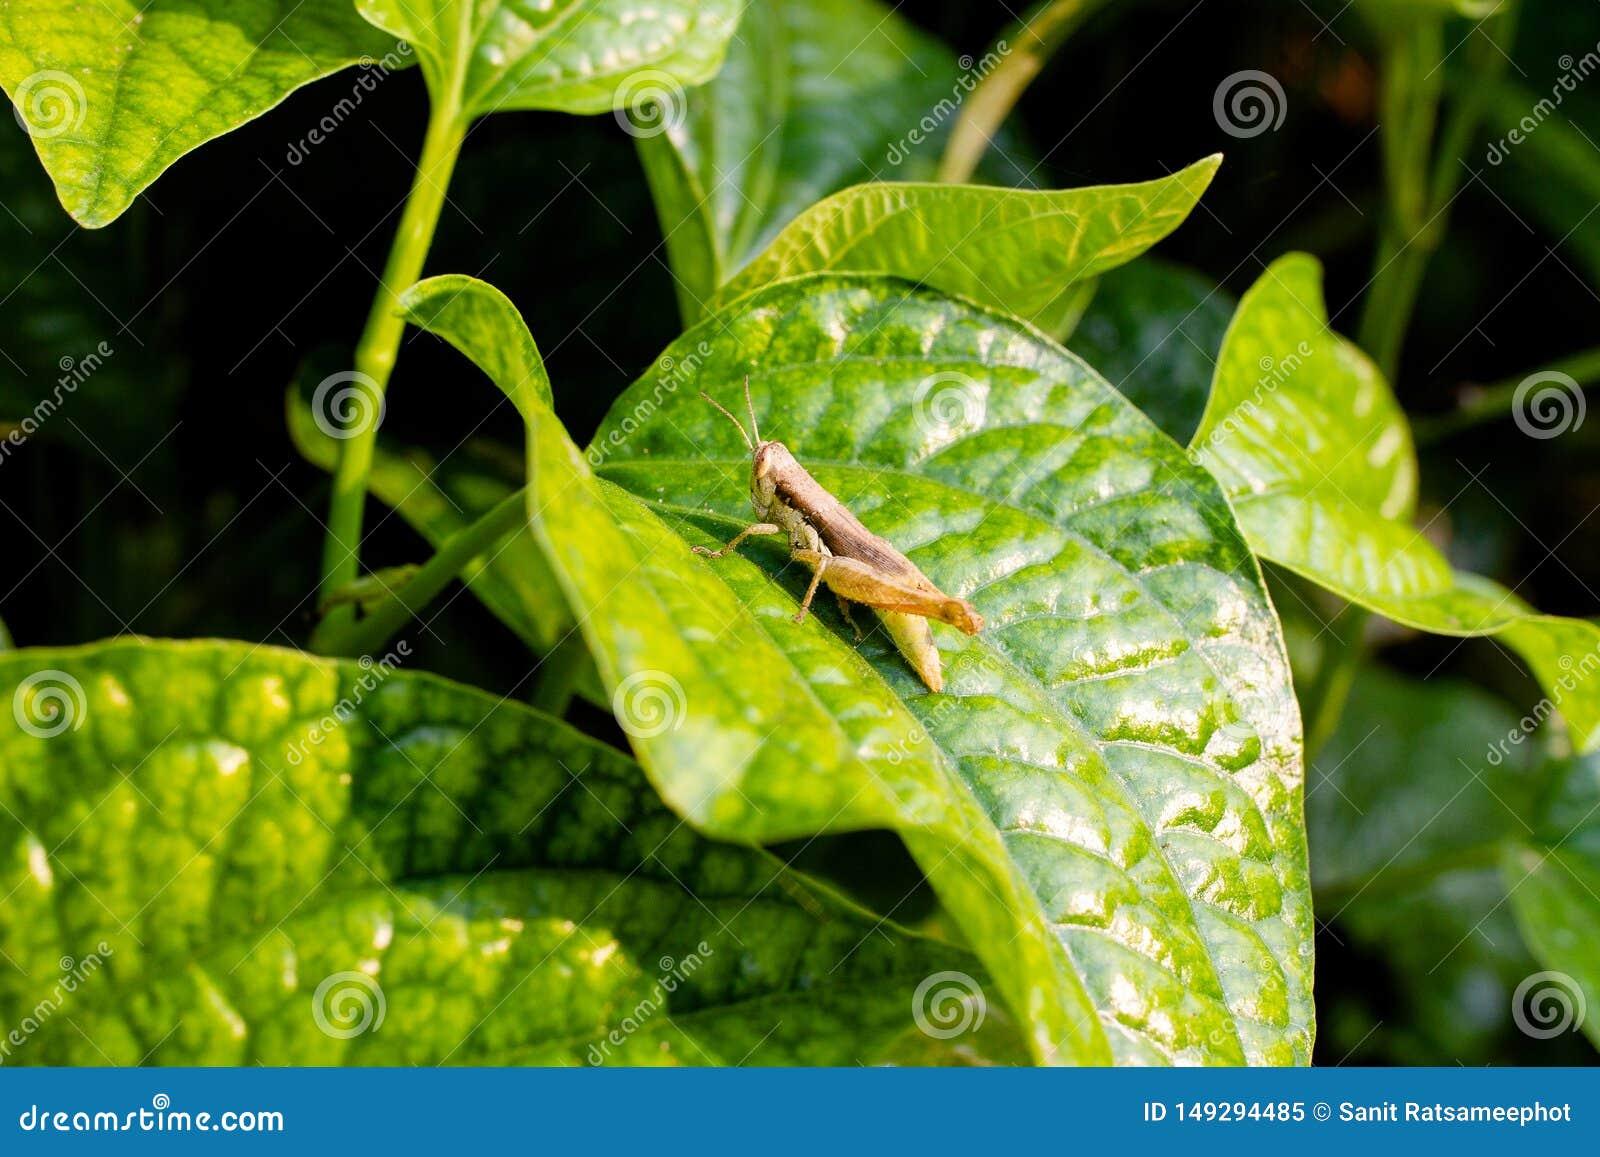 Thai Pepper Leaf Piper sarmentosum Lalot Creeping Herb Plant